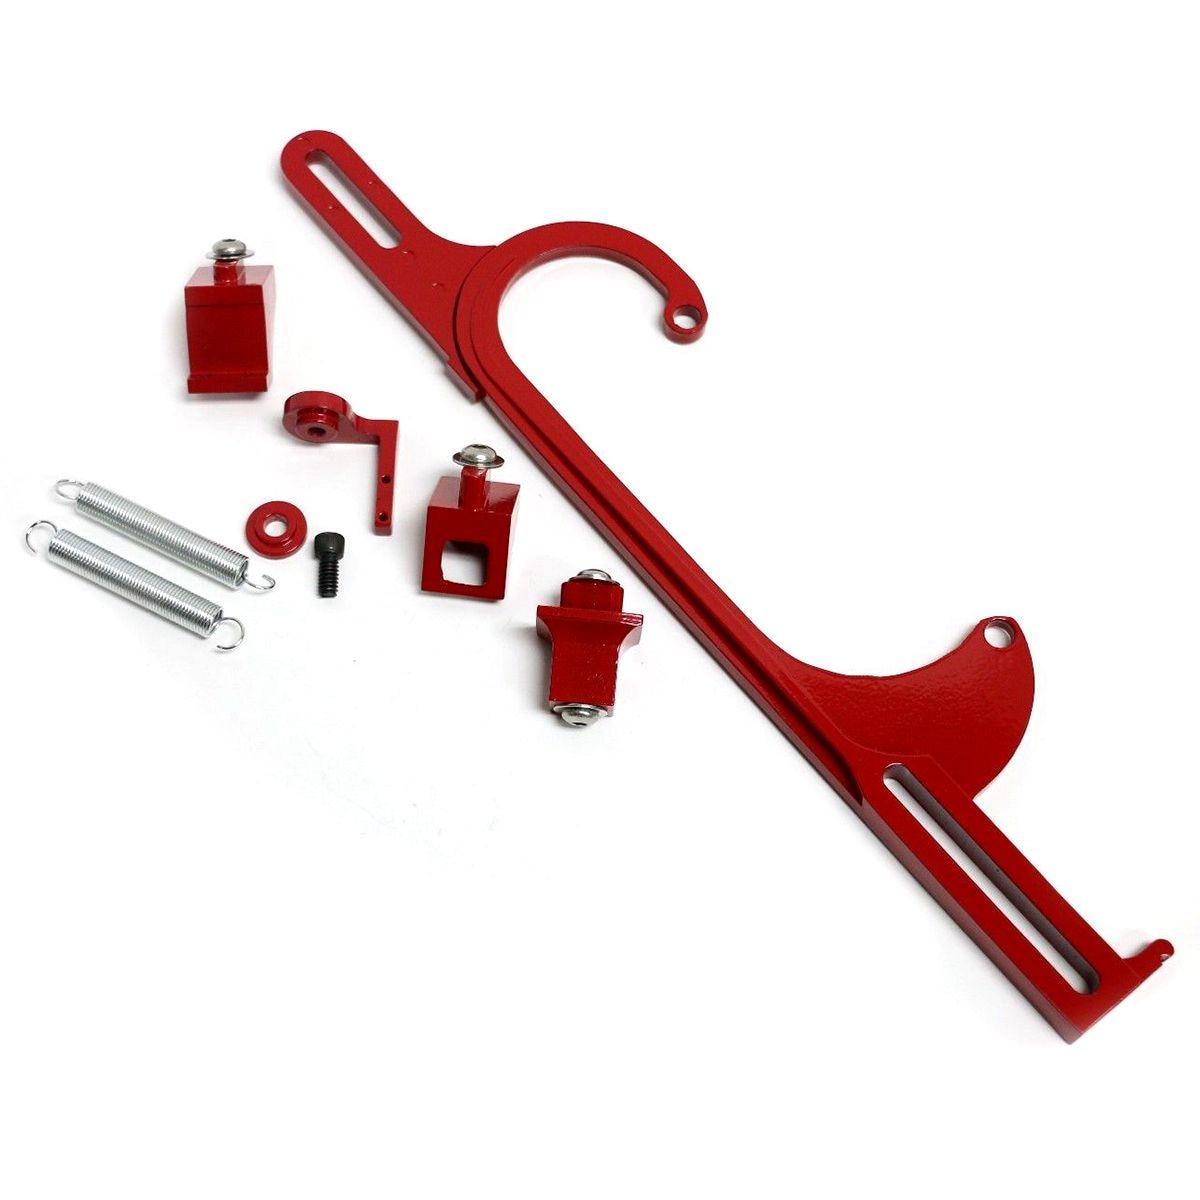 4150 4160 Red Aluminum Throttle Cable Carb Bracket Carburetor 350 SBC4150 4160 Red Aluminum Throttle Cable Carb Bracket Carburetor 350 SBC